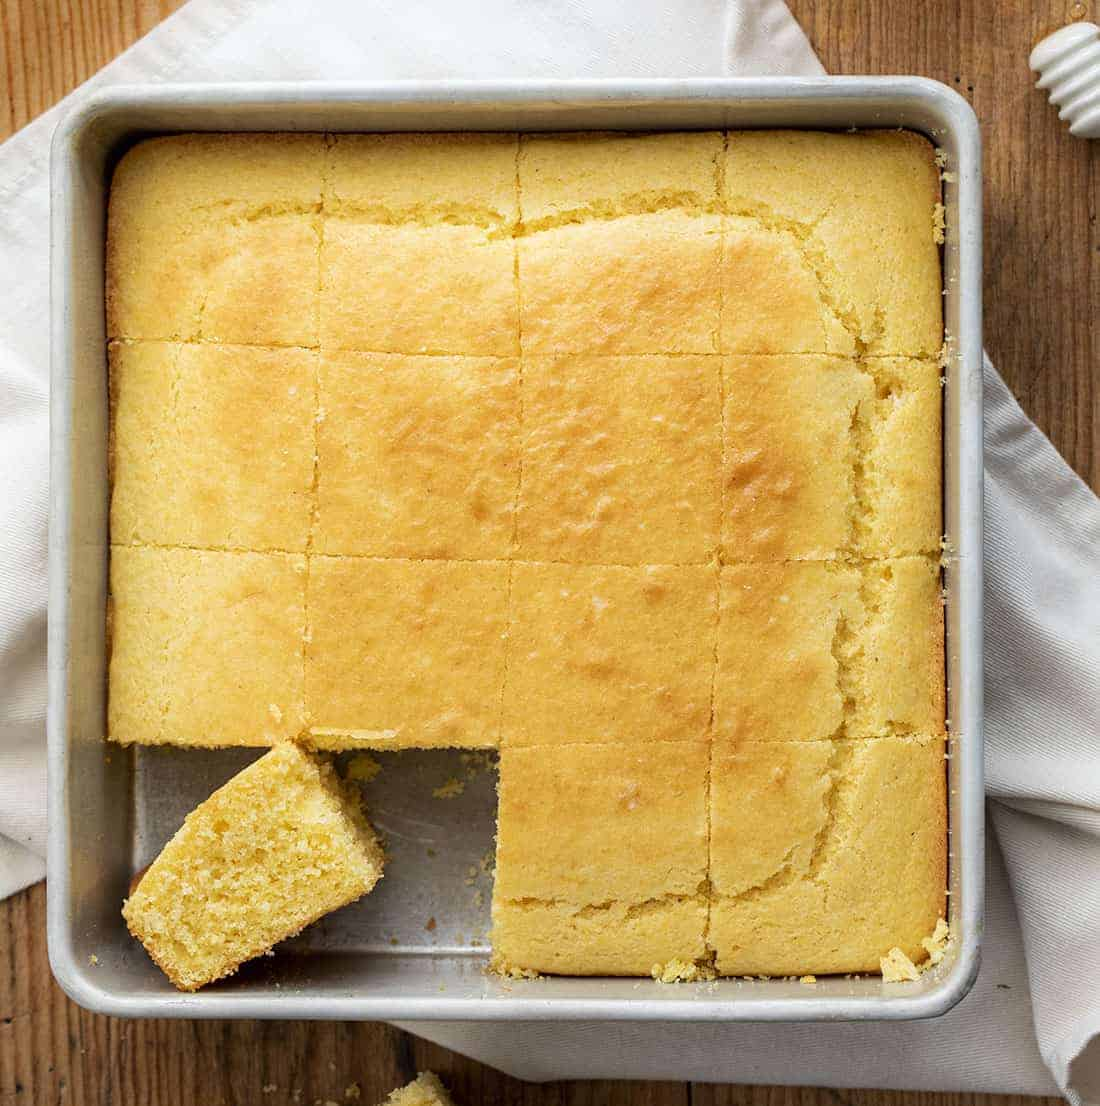 Overhead Image of Sliced Cornbread in a Pan